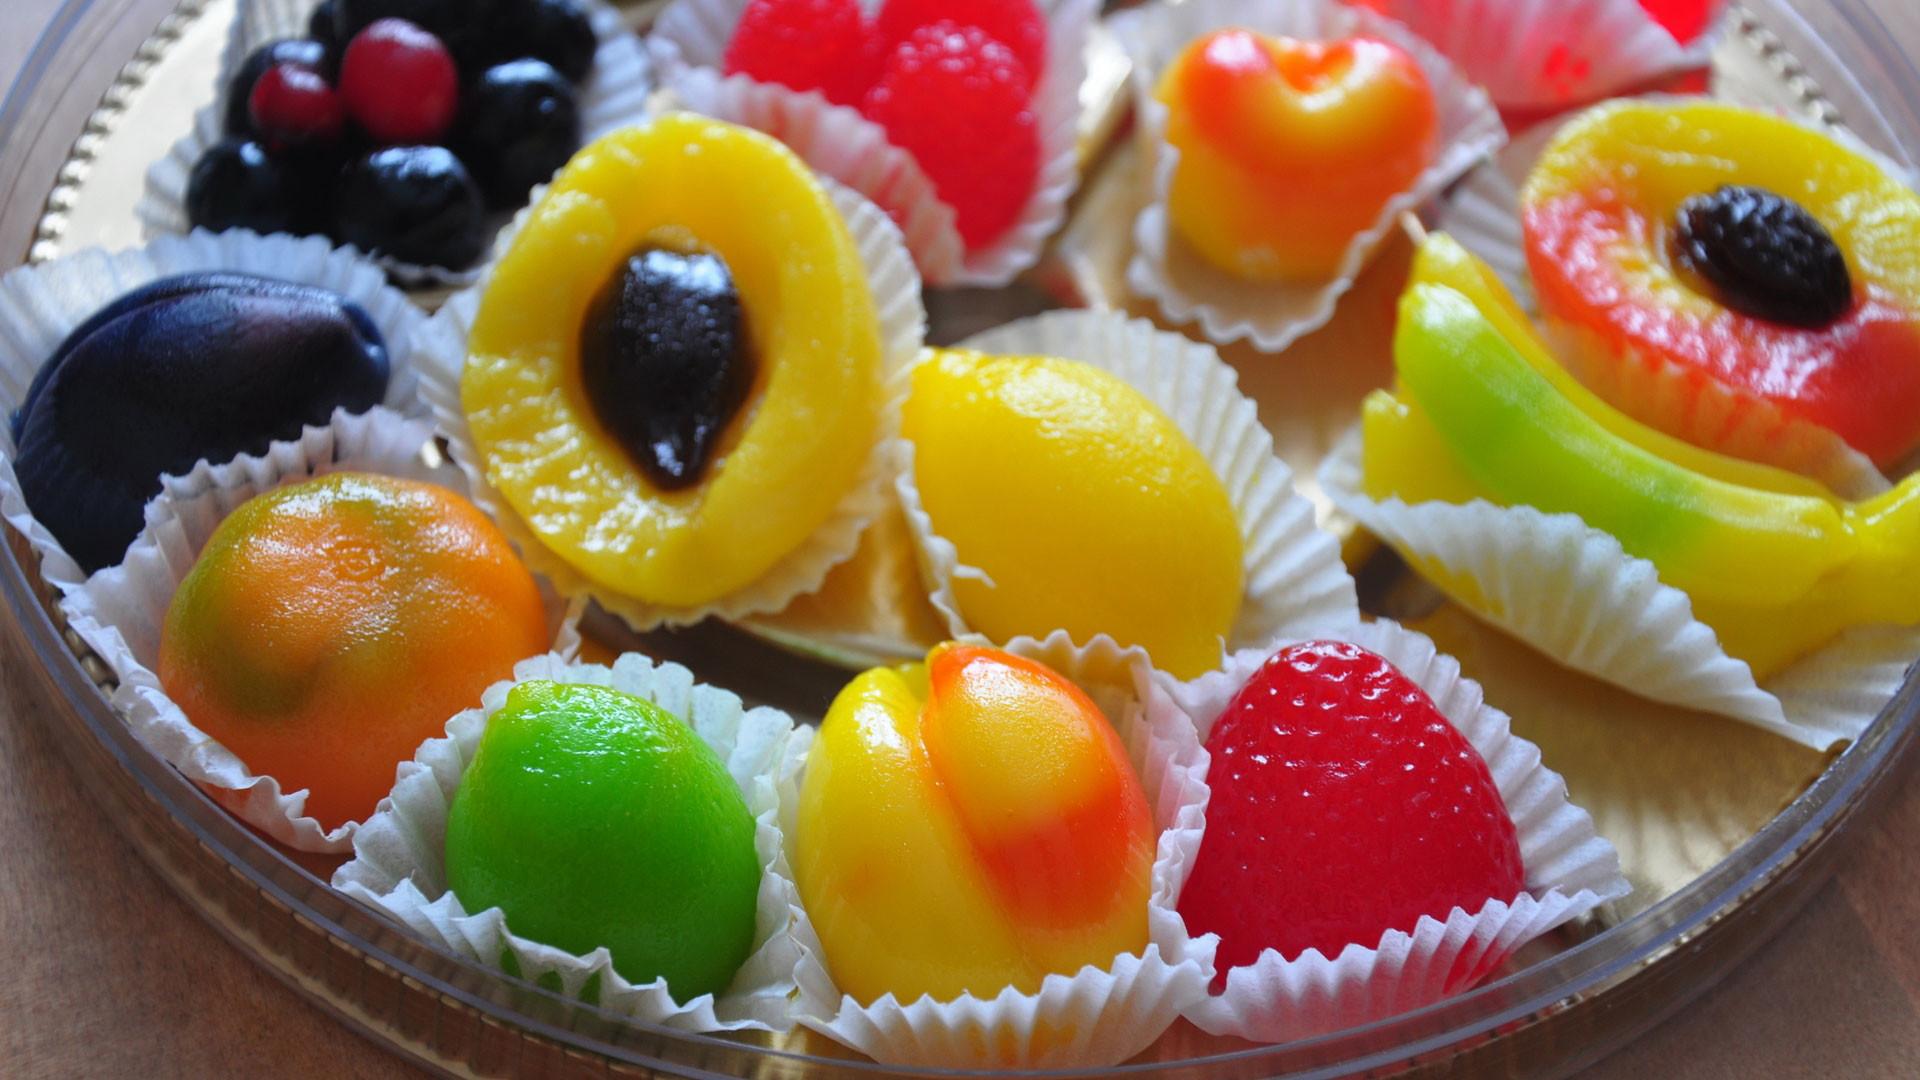 hd pics photos food beautiful colorful desktop background wallpaper